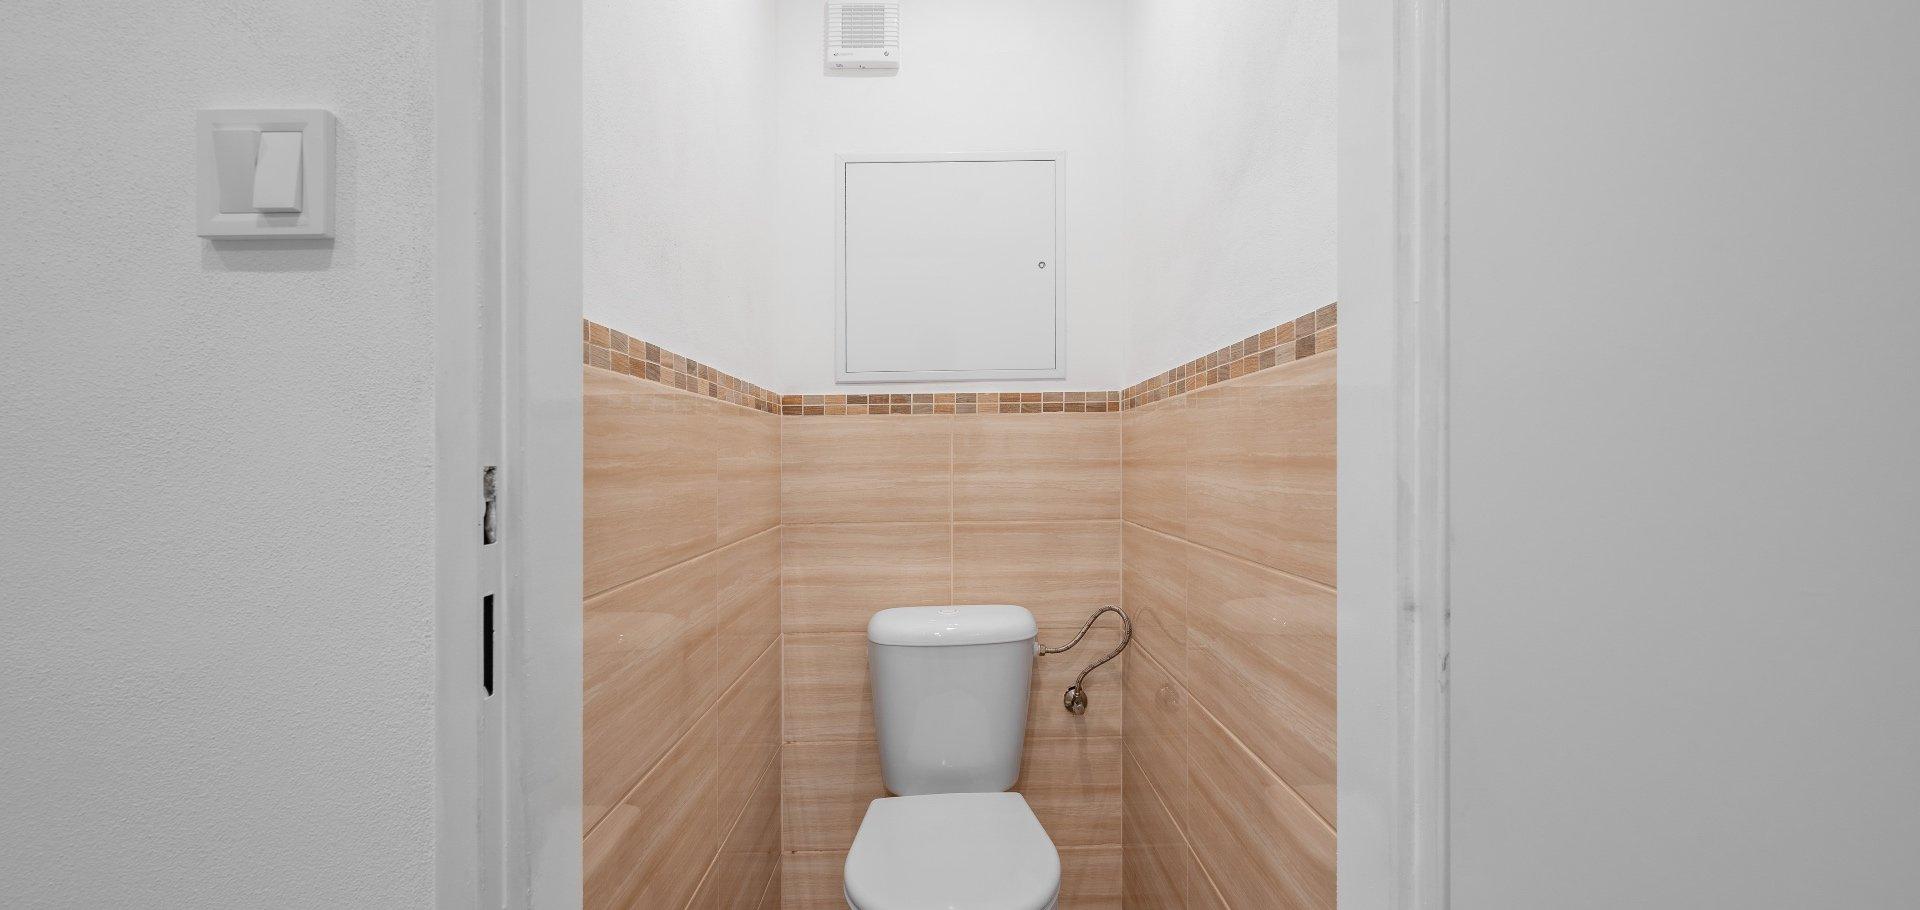 Pronájem, Byty 1+kk, 27m² - Praha - Troja